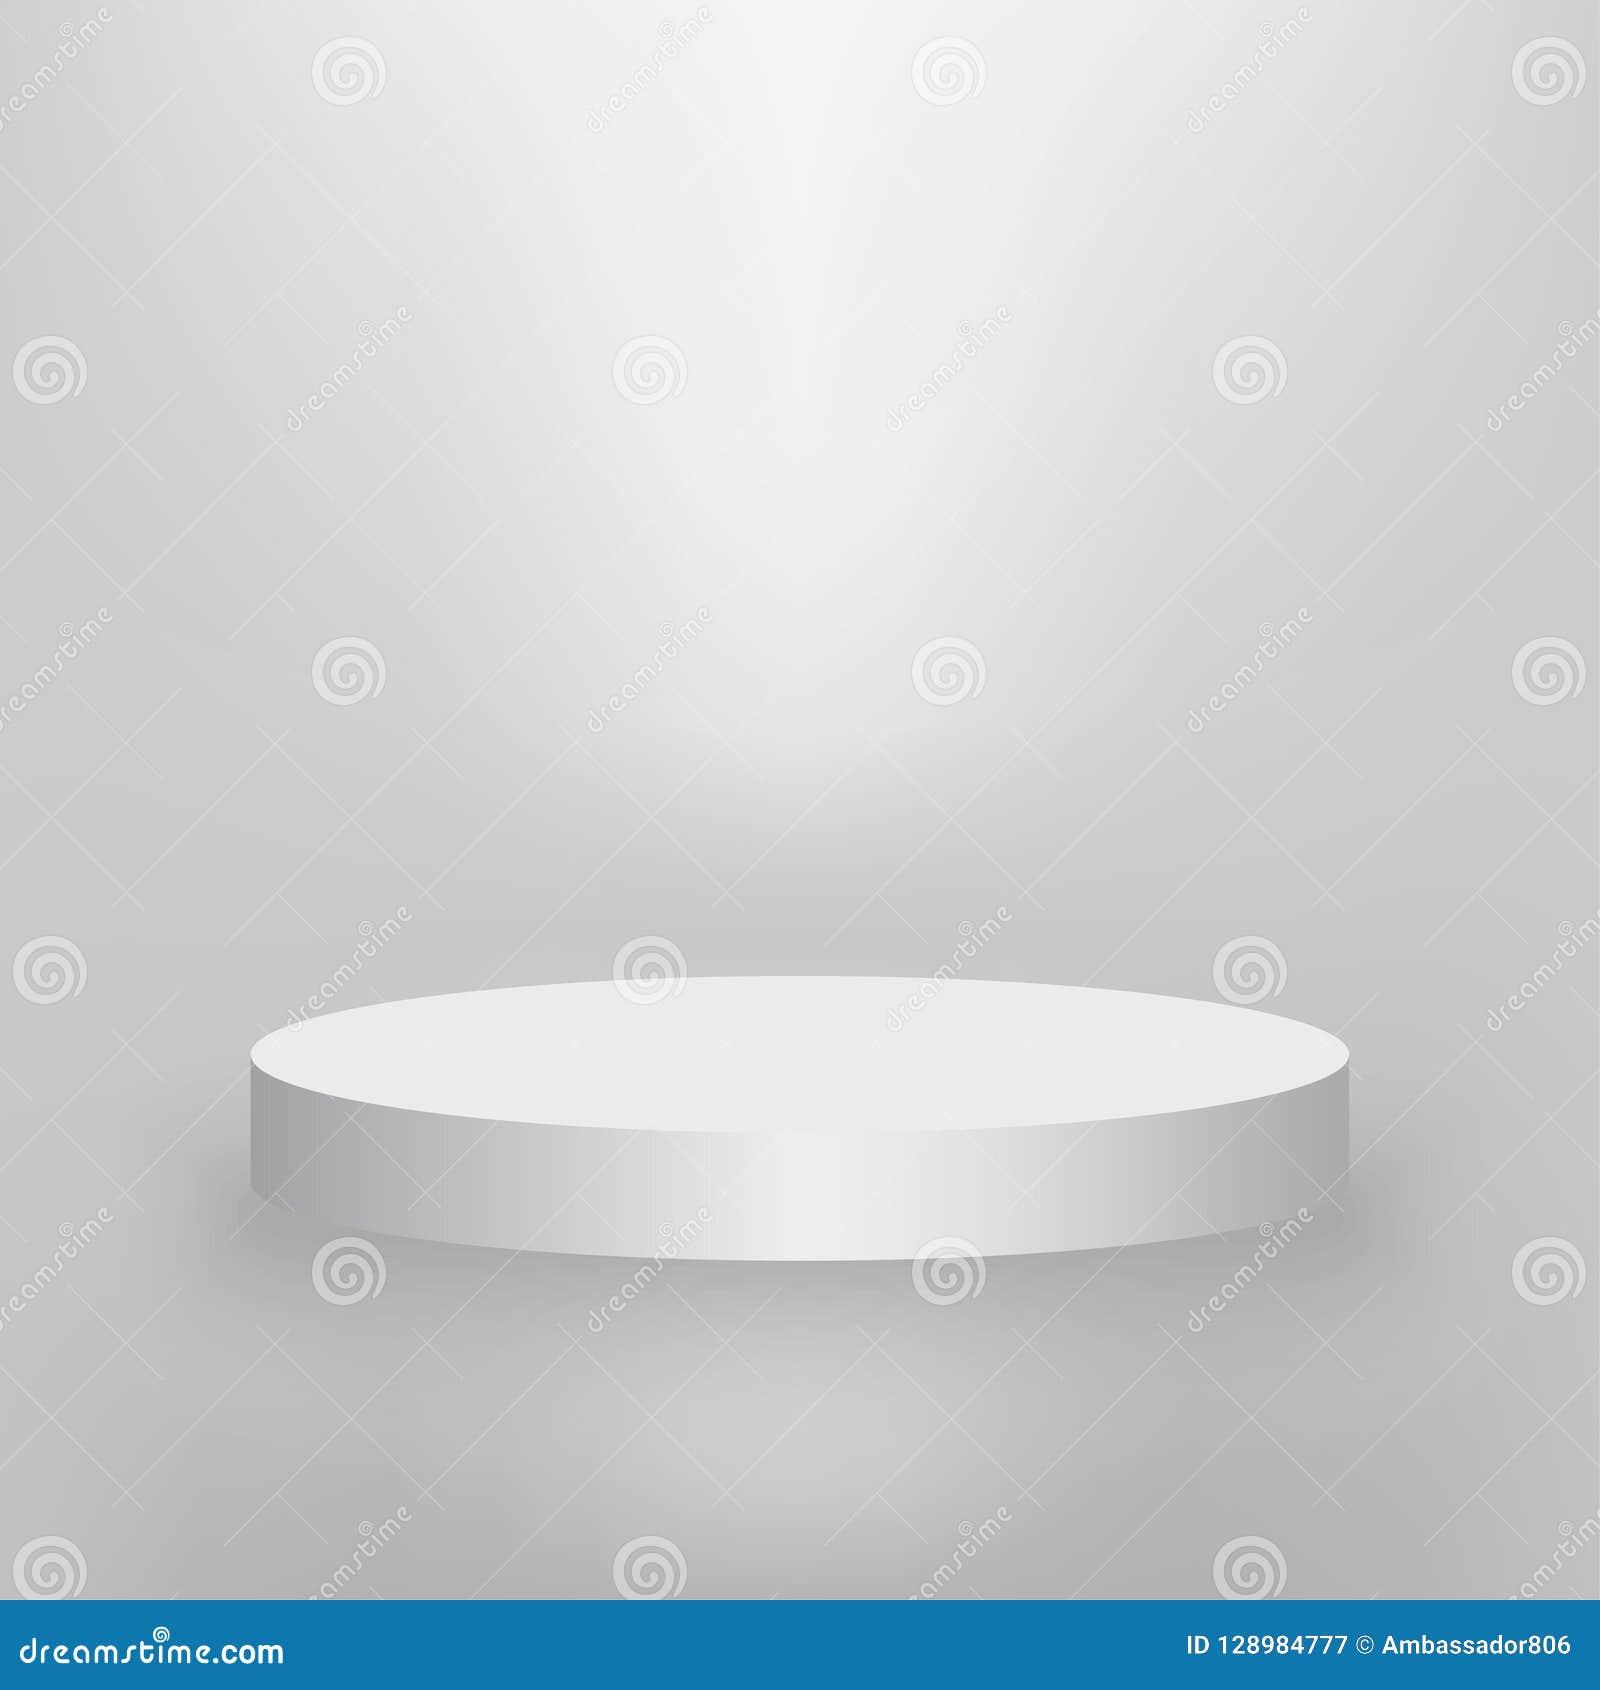 product presentation podium white stage empty white pedestal